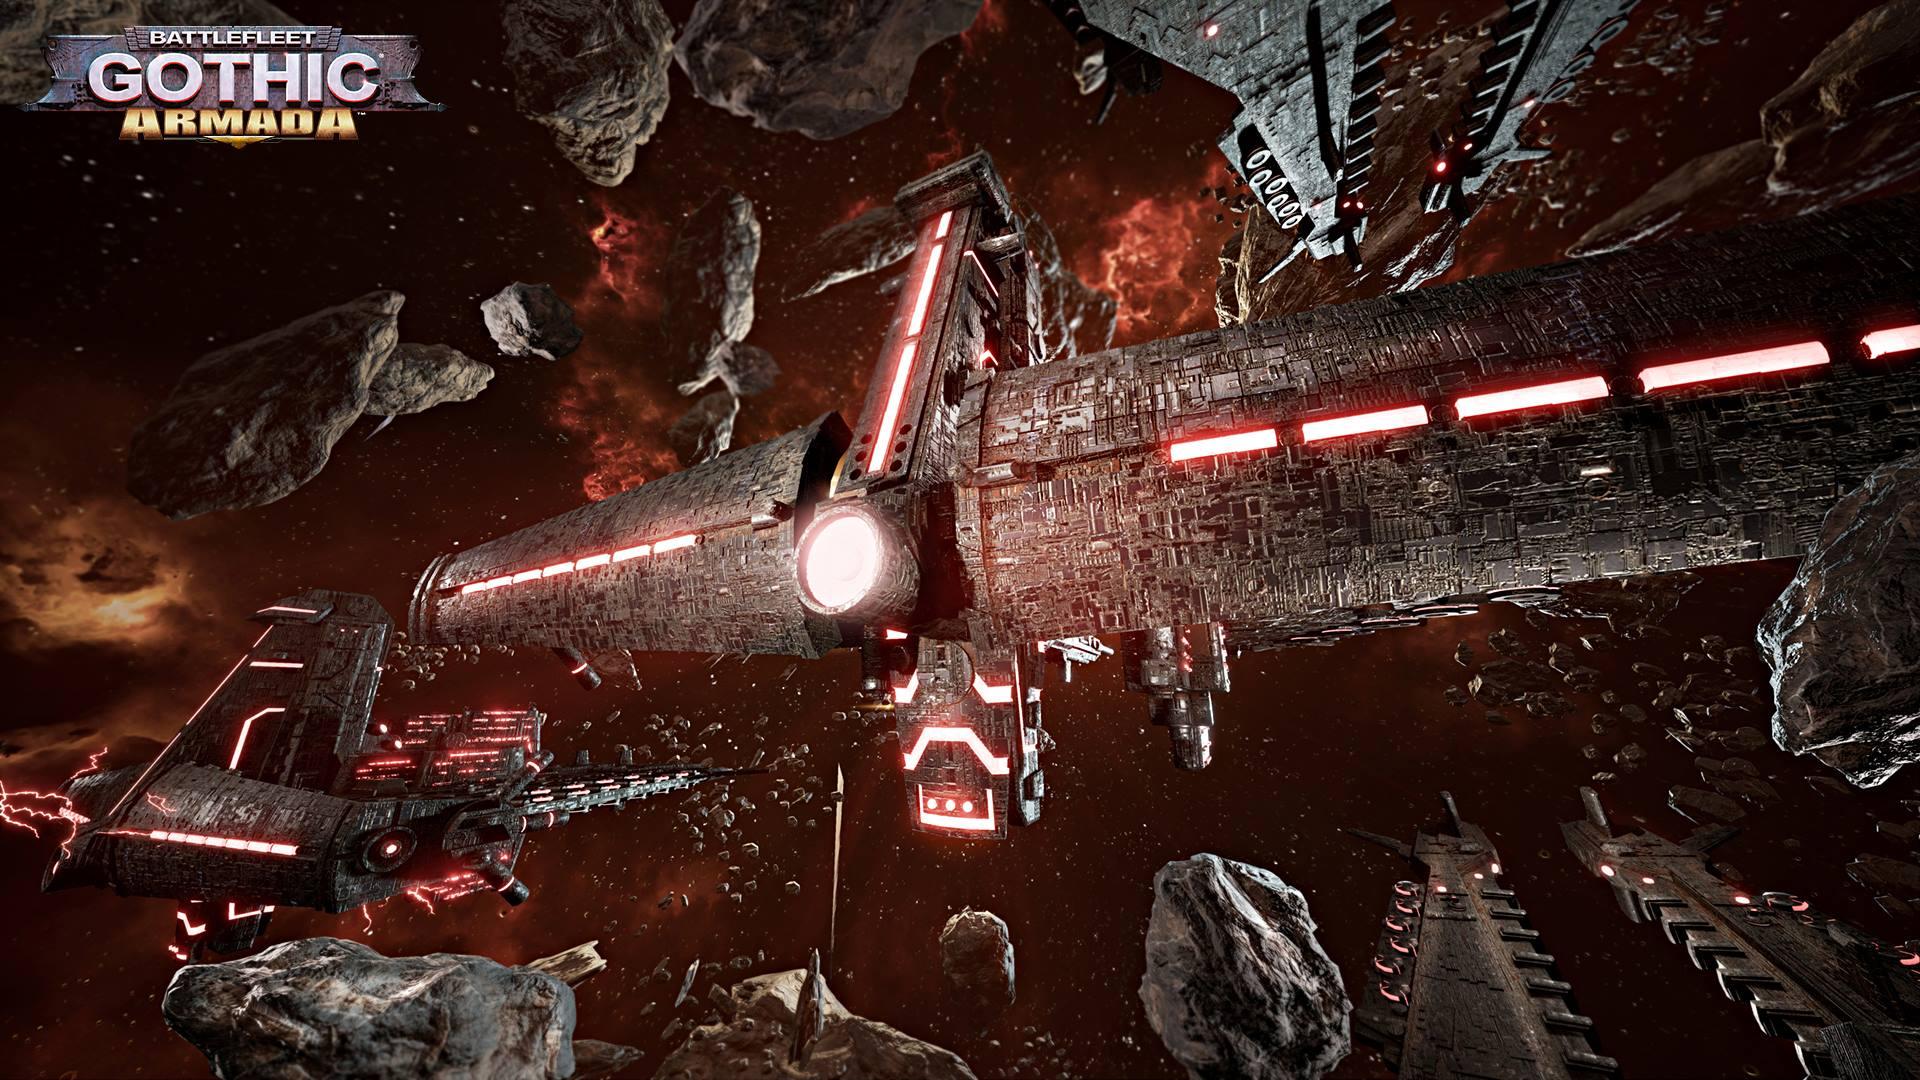 battlefleet gothic armada вечная загрузка